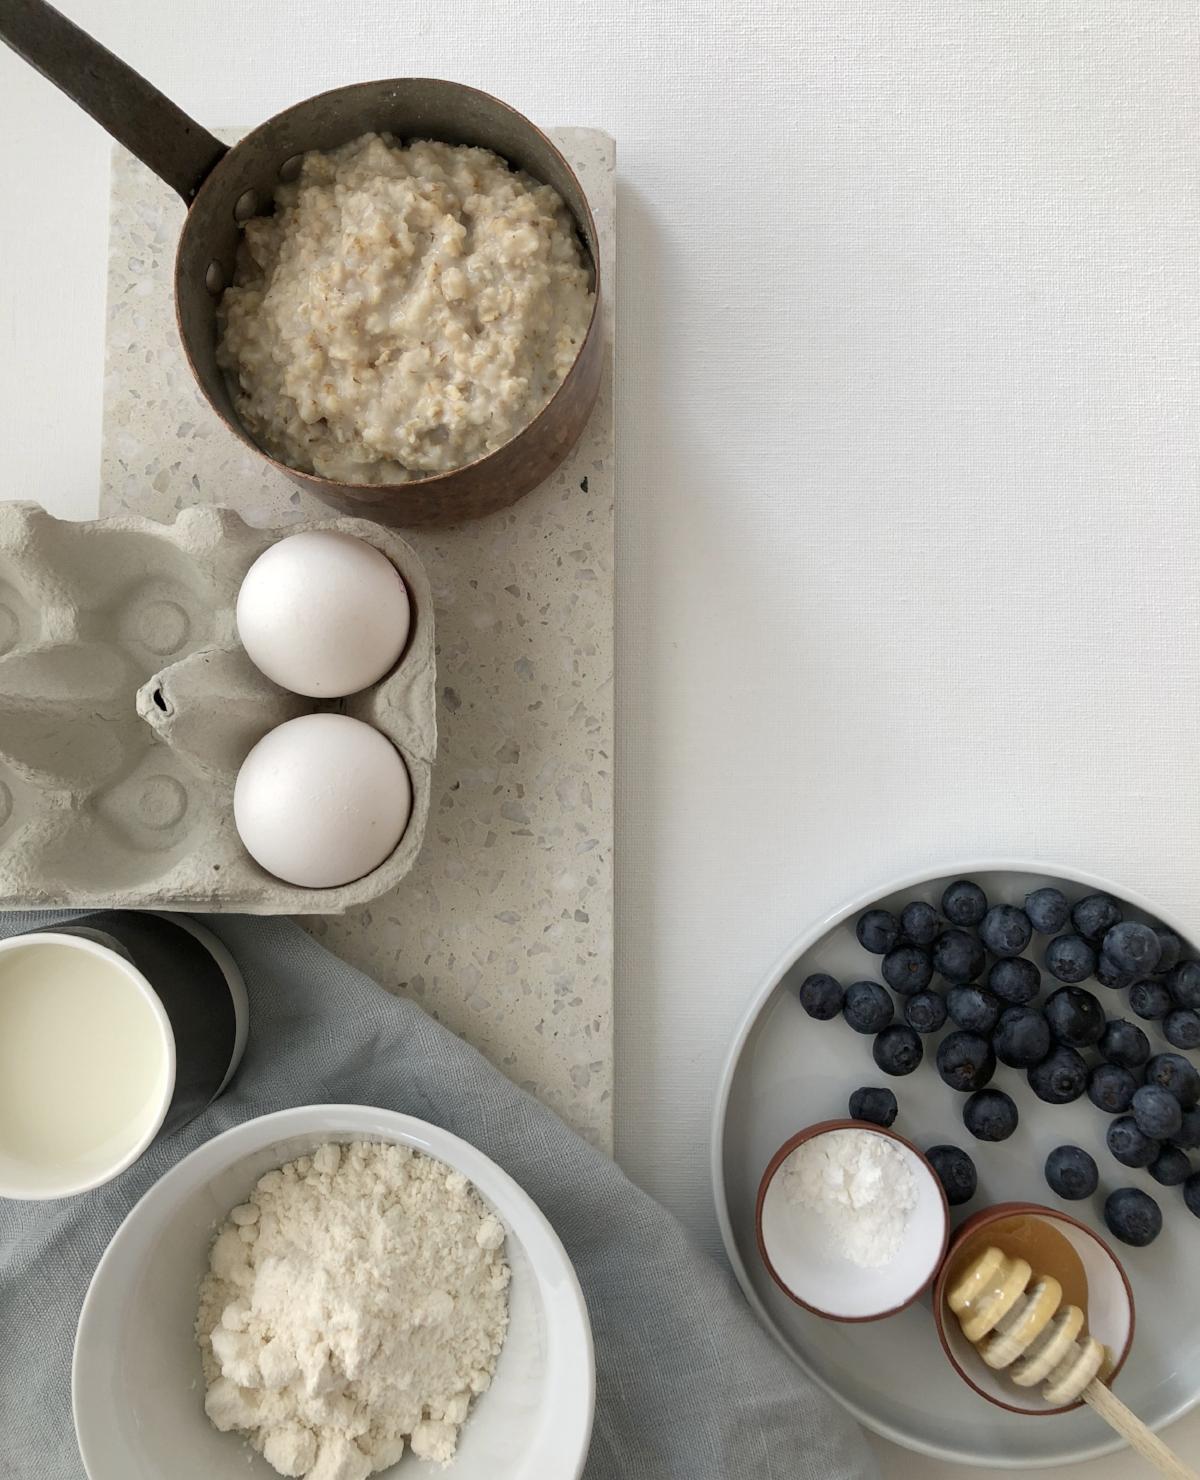 a5360a24 2 dl melk 1 ts bakepulver 1 ss flytende honning. Evt ferske blåbær eller  bringebær smør eller olje til steking